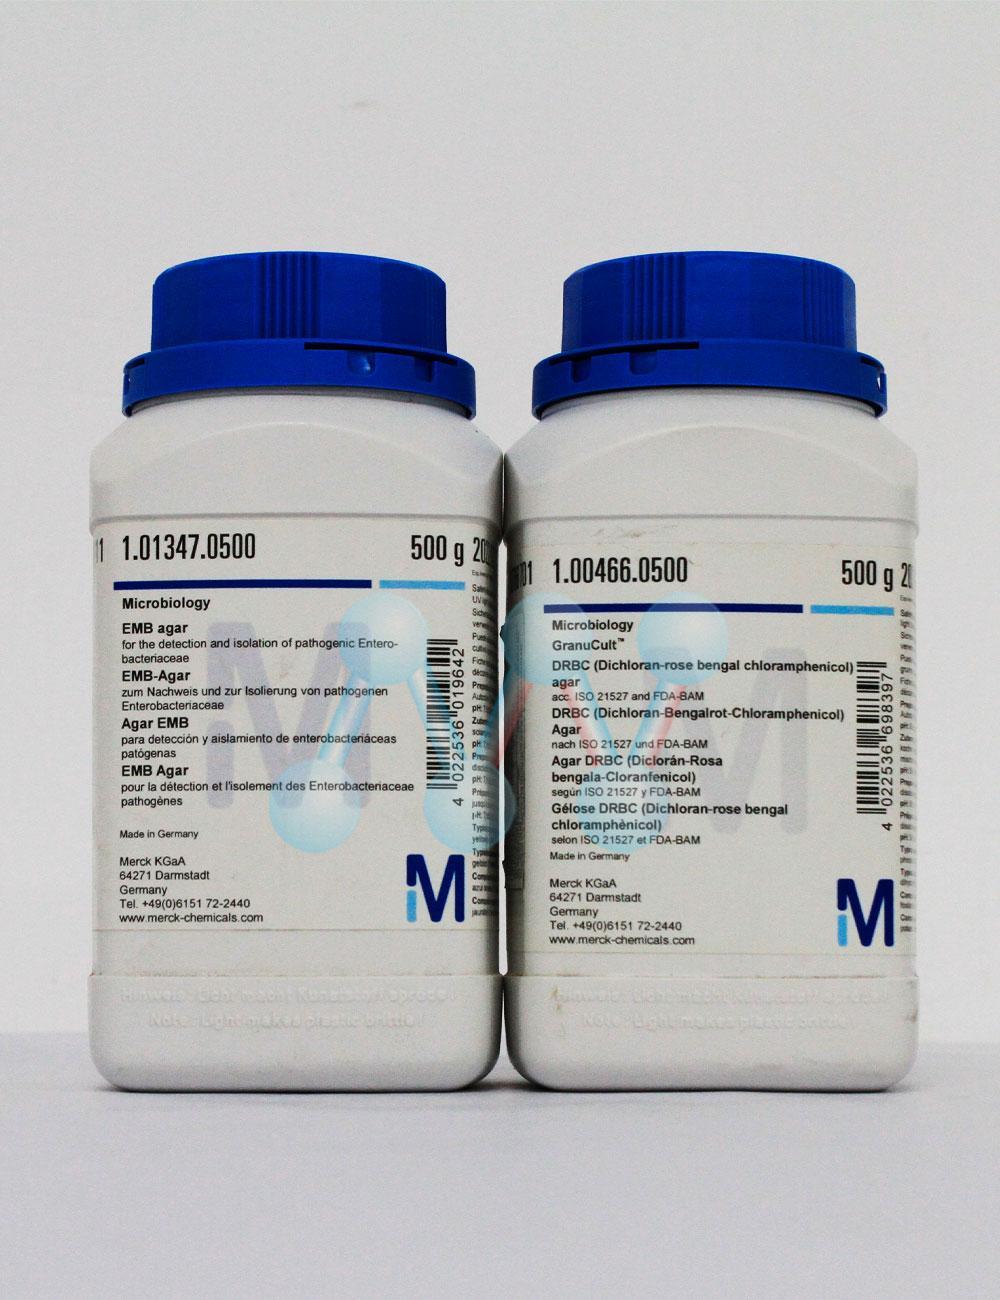 Lauryl Tryptose Broth (Lauryl Sulfate Broth)